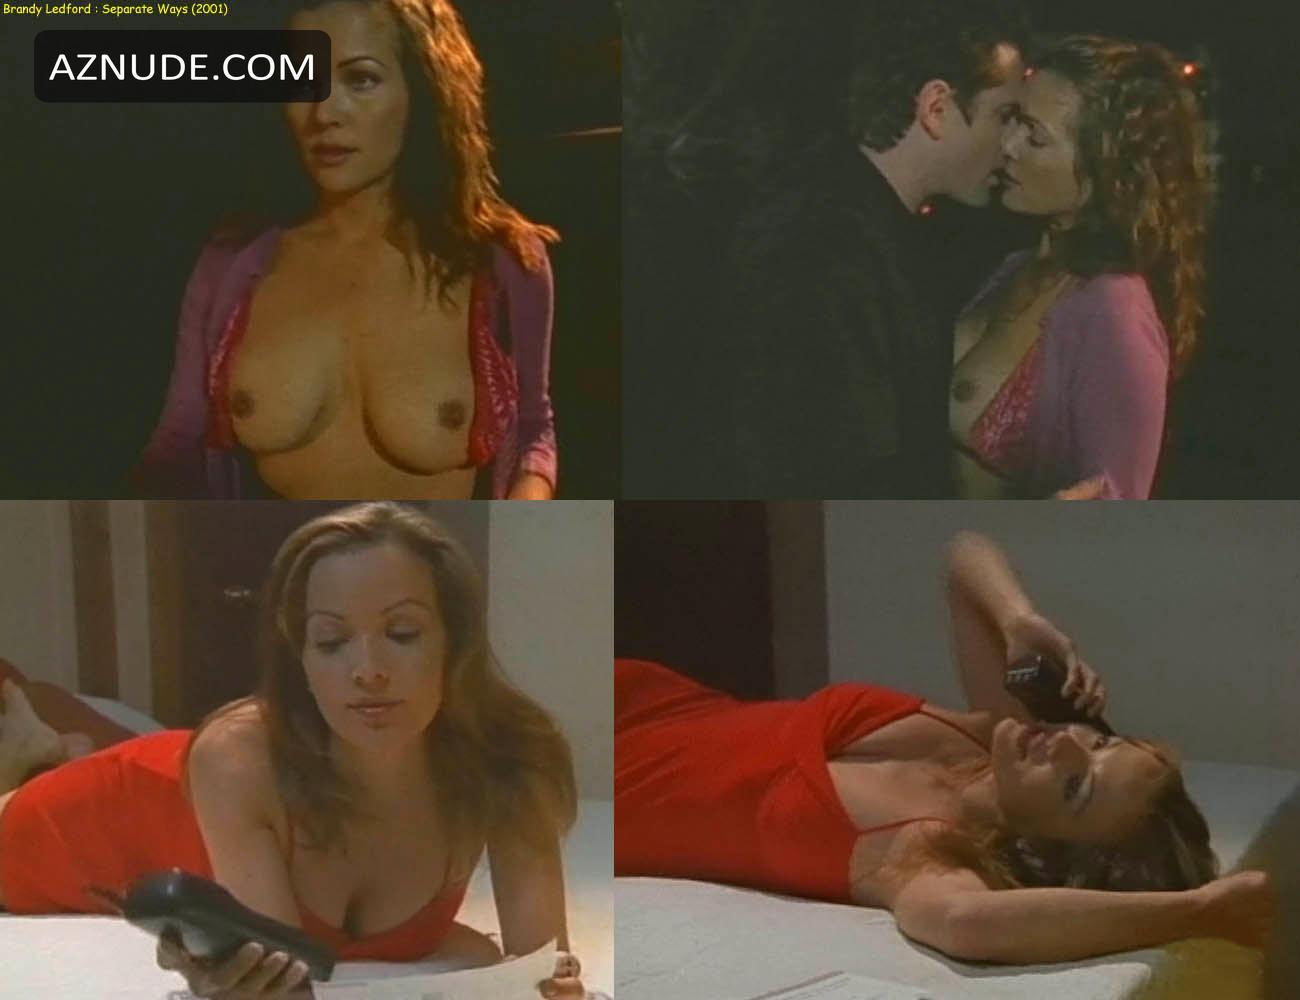 Good brandy ledford sex foto can